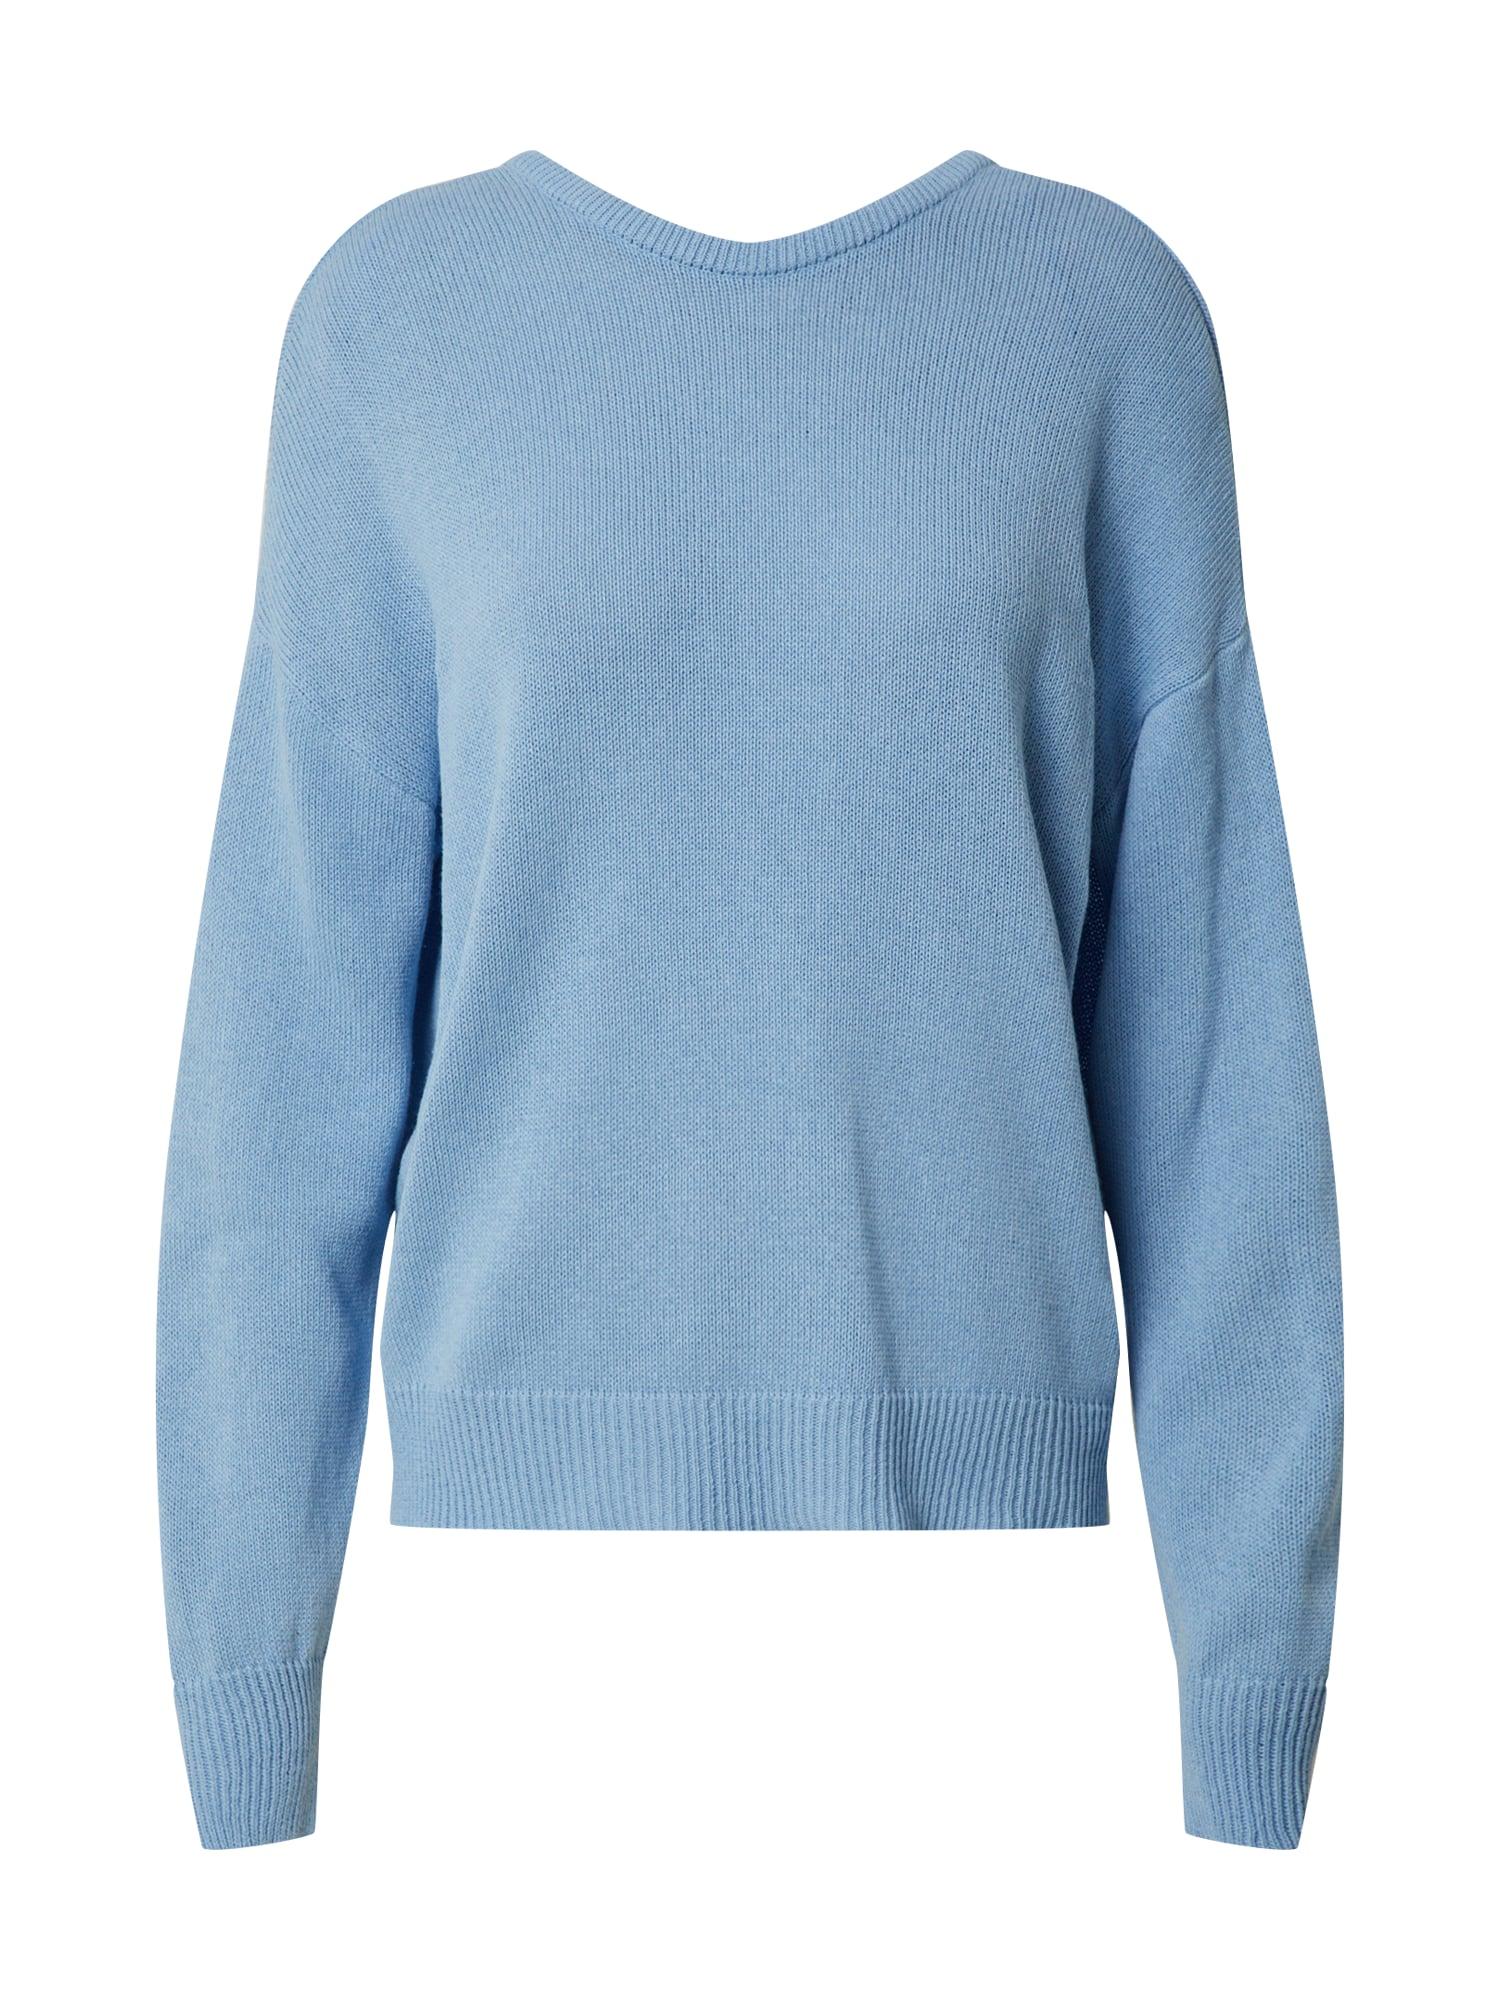 NU-IN Megztinis šviesiai mėlyna